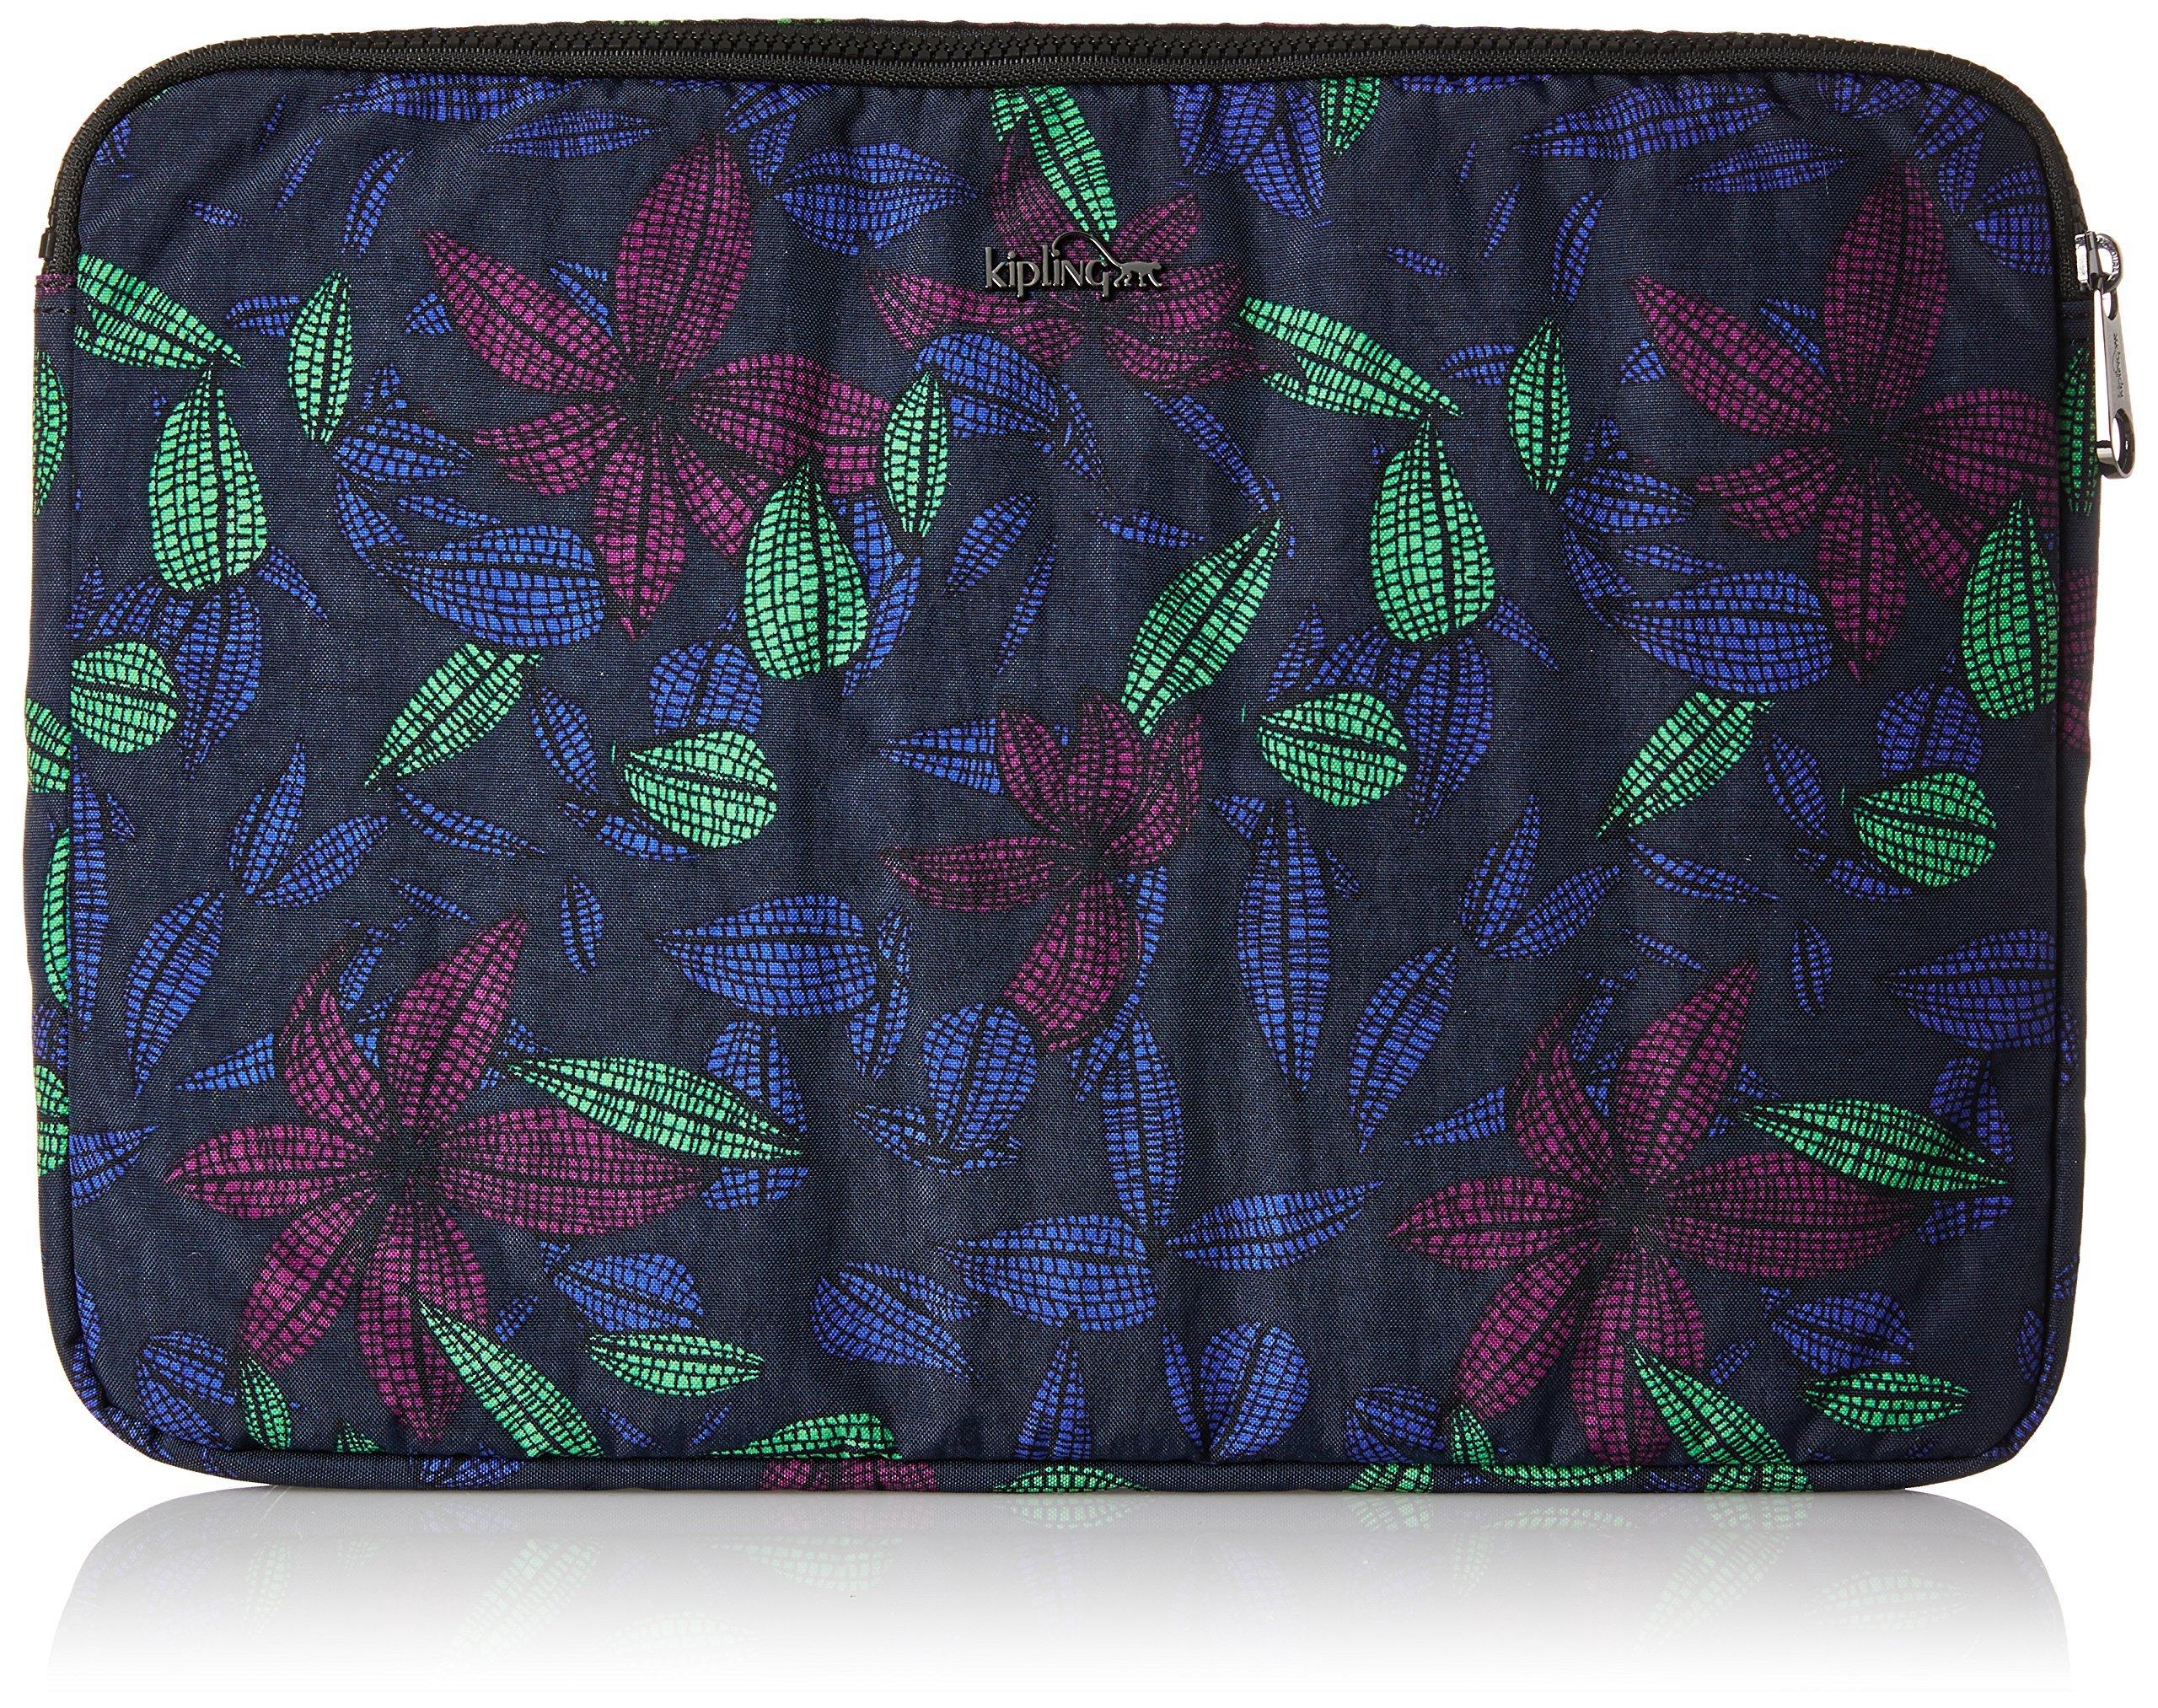 Kipling - LAPTOP COVER 15 - Laptop cover - Orchid Garden - (Print) by Kipling